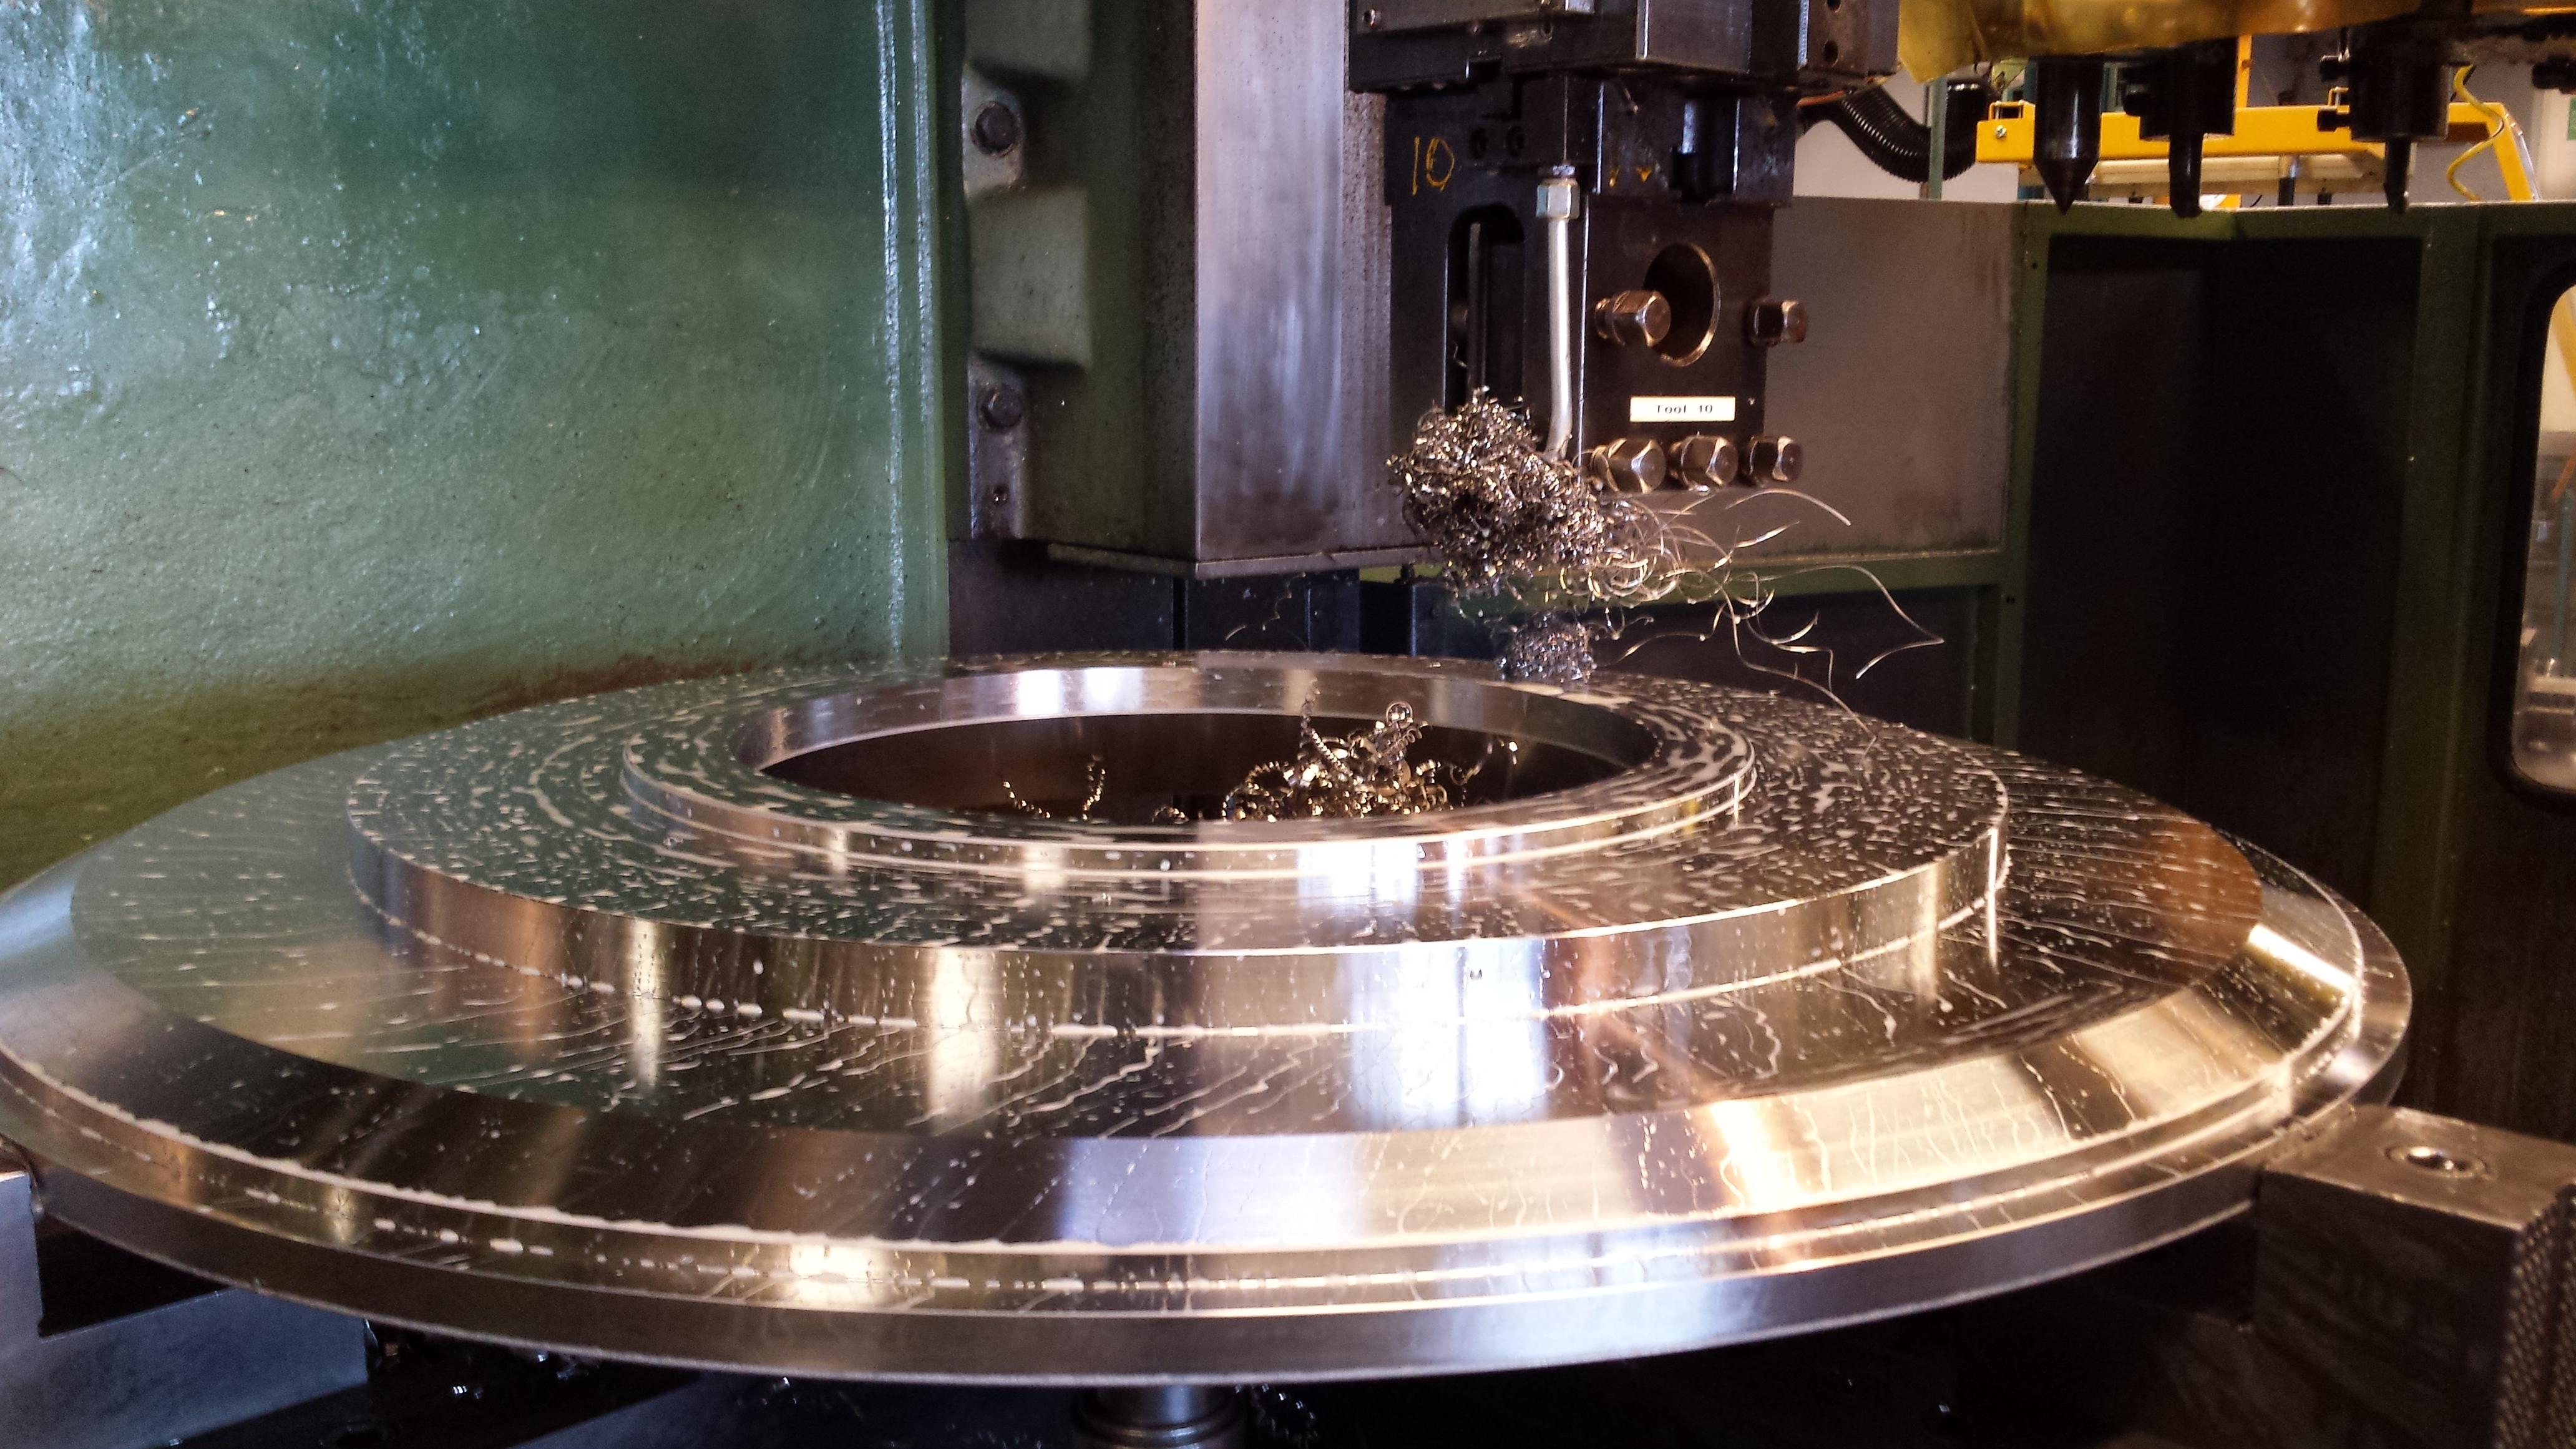 Benelux service center producing part flange